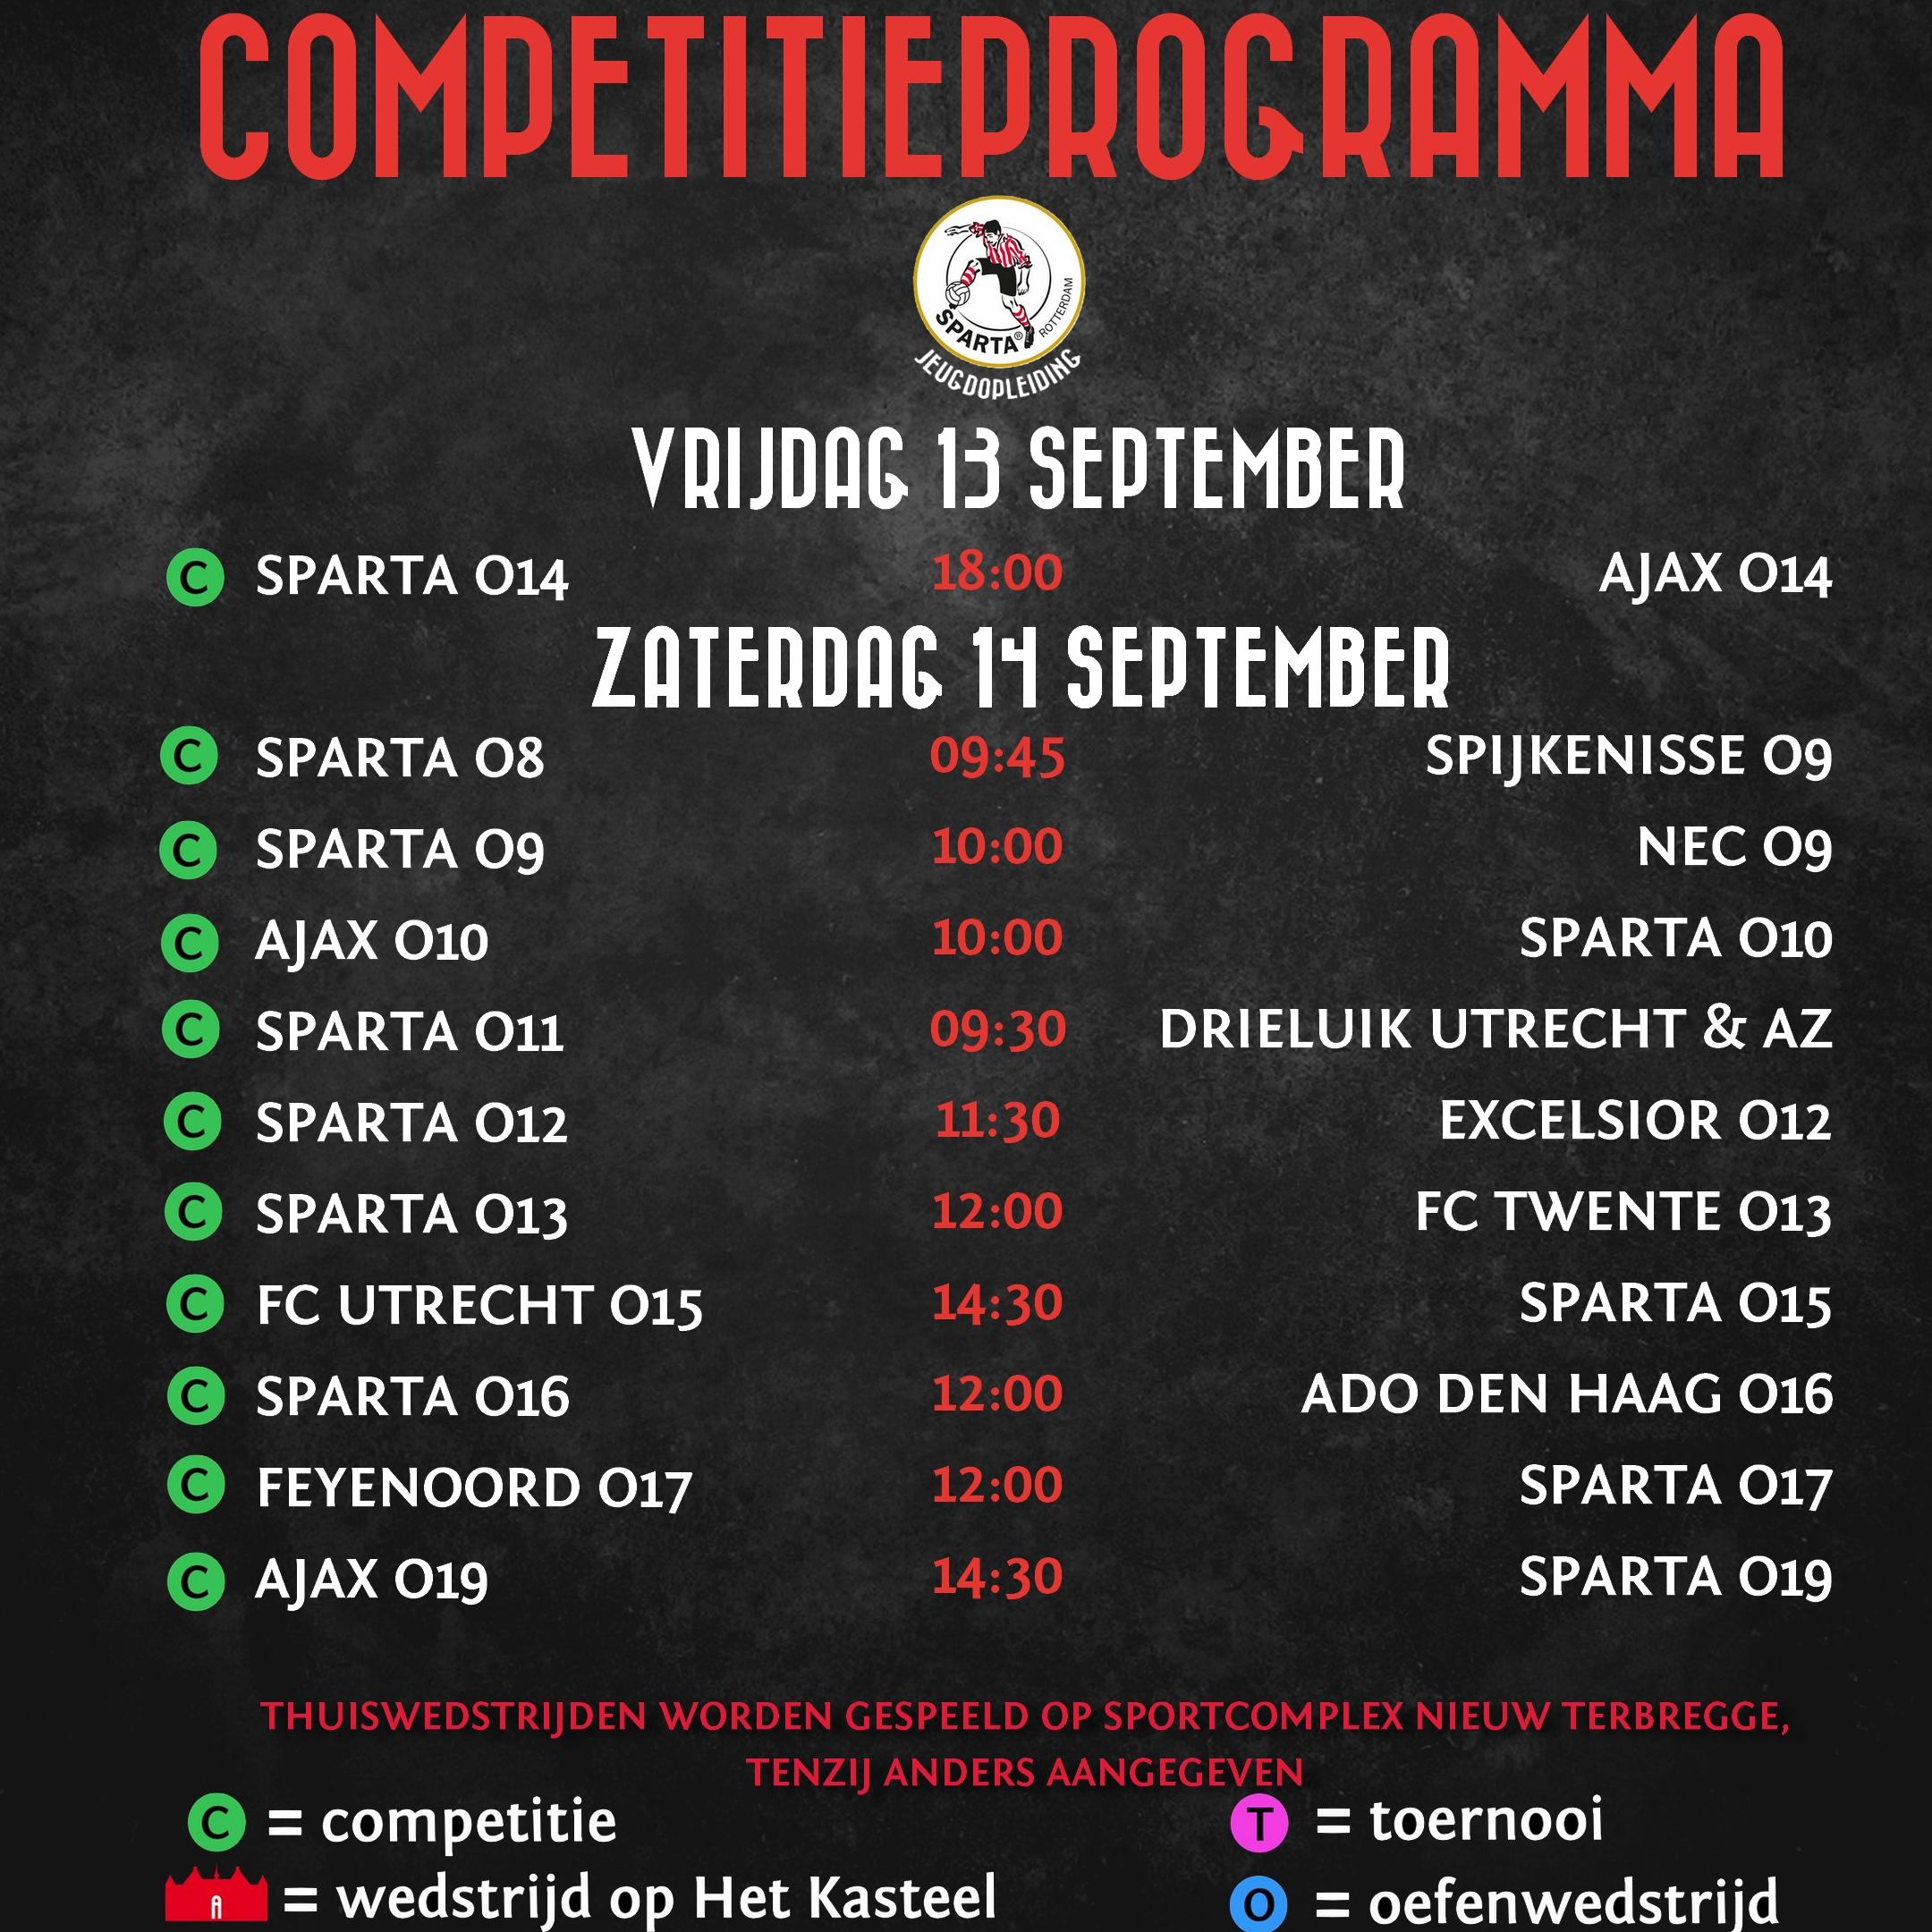 Derby Voor Sparta O17 O19 Op Bezoek In Amsterdam Sparta